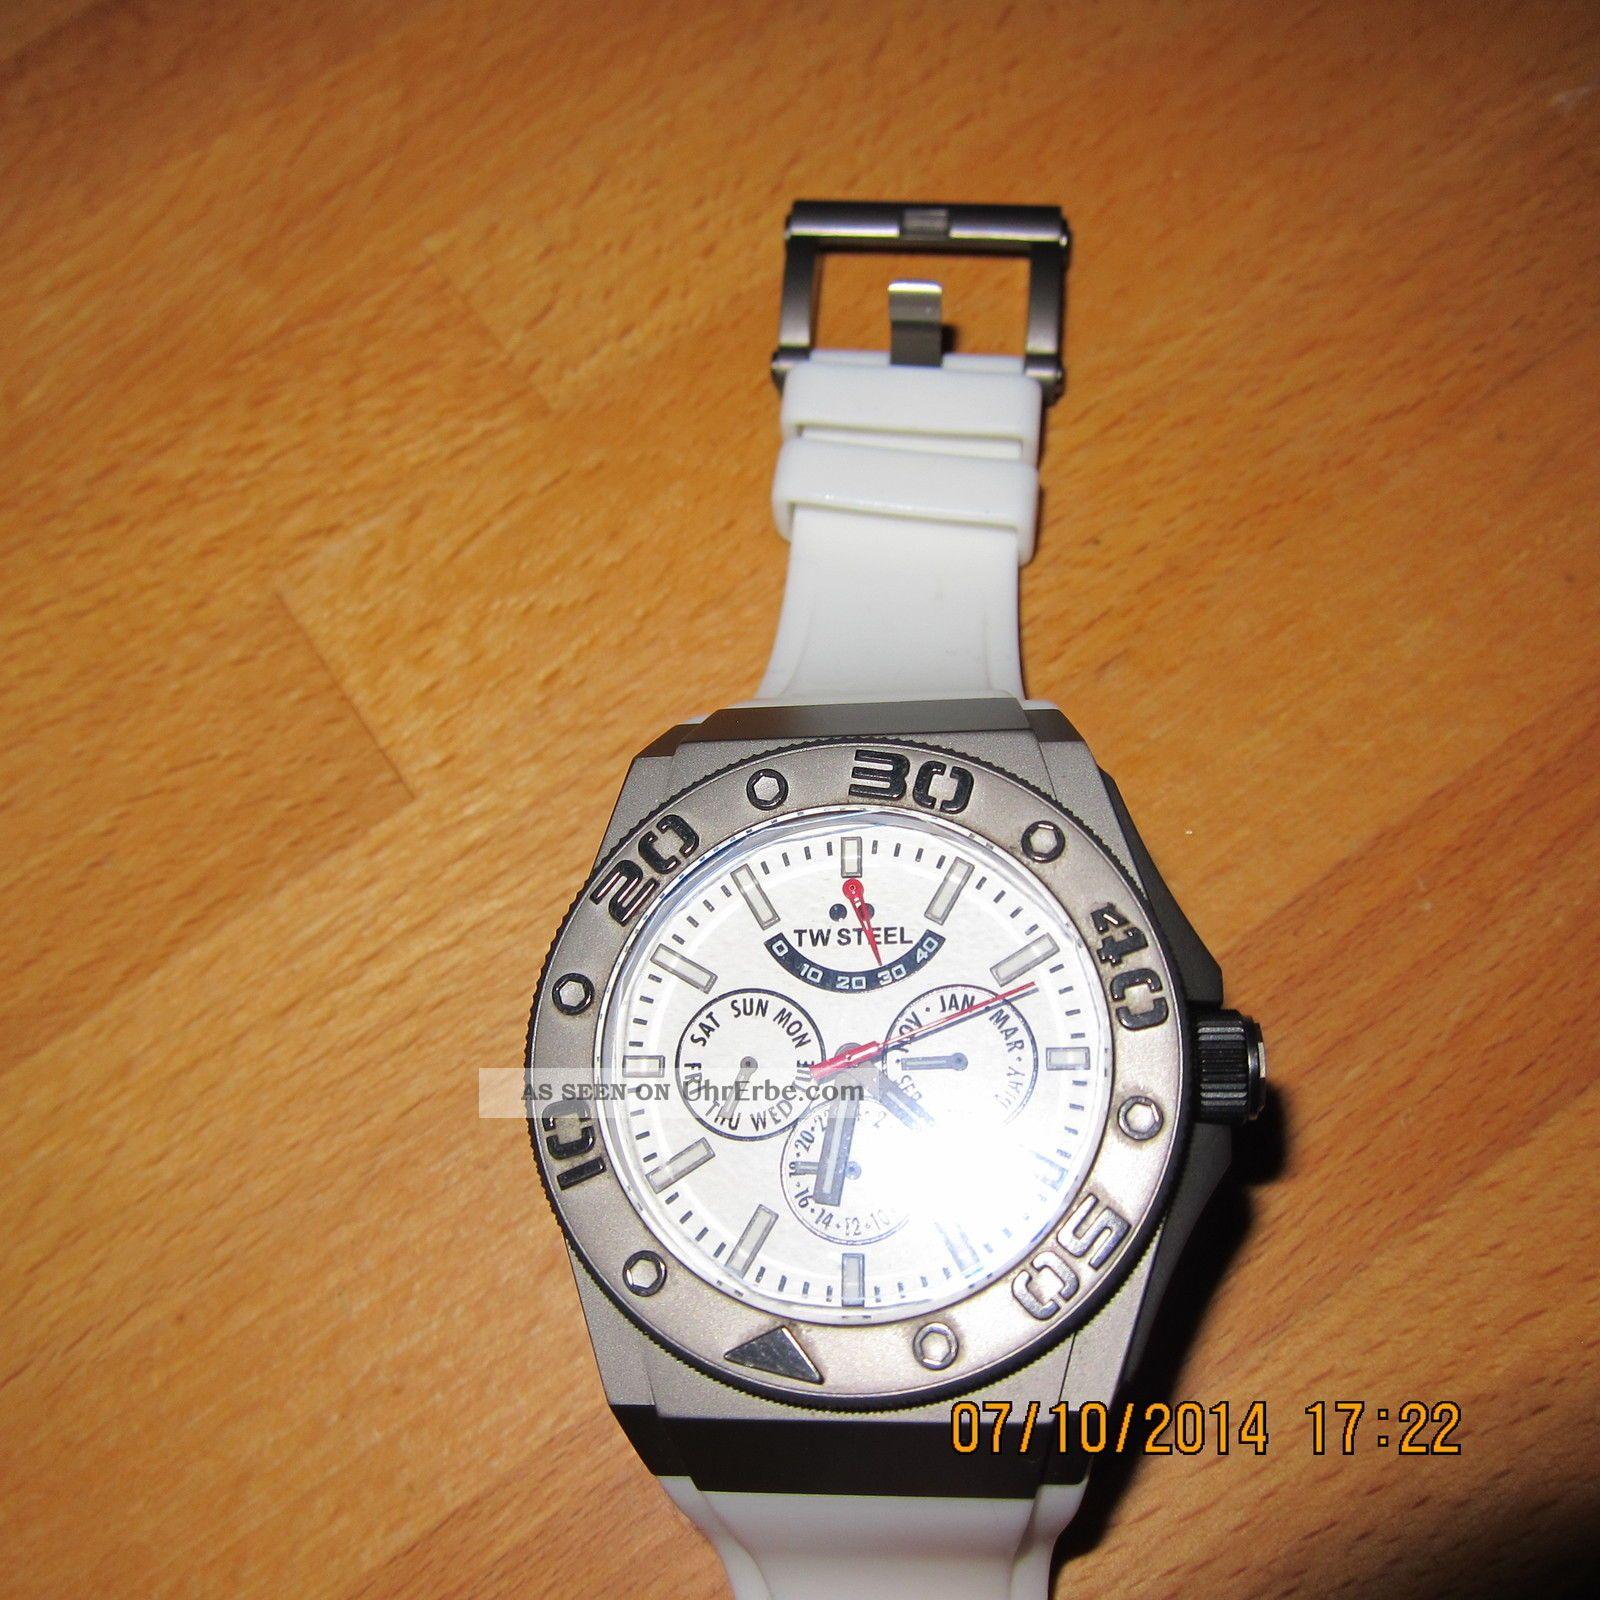 Tw Steel Wie Twce 5003 Ceo Diver Automatik Herren - Armbanduhr Weiss Armbanduhren Bild